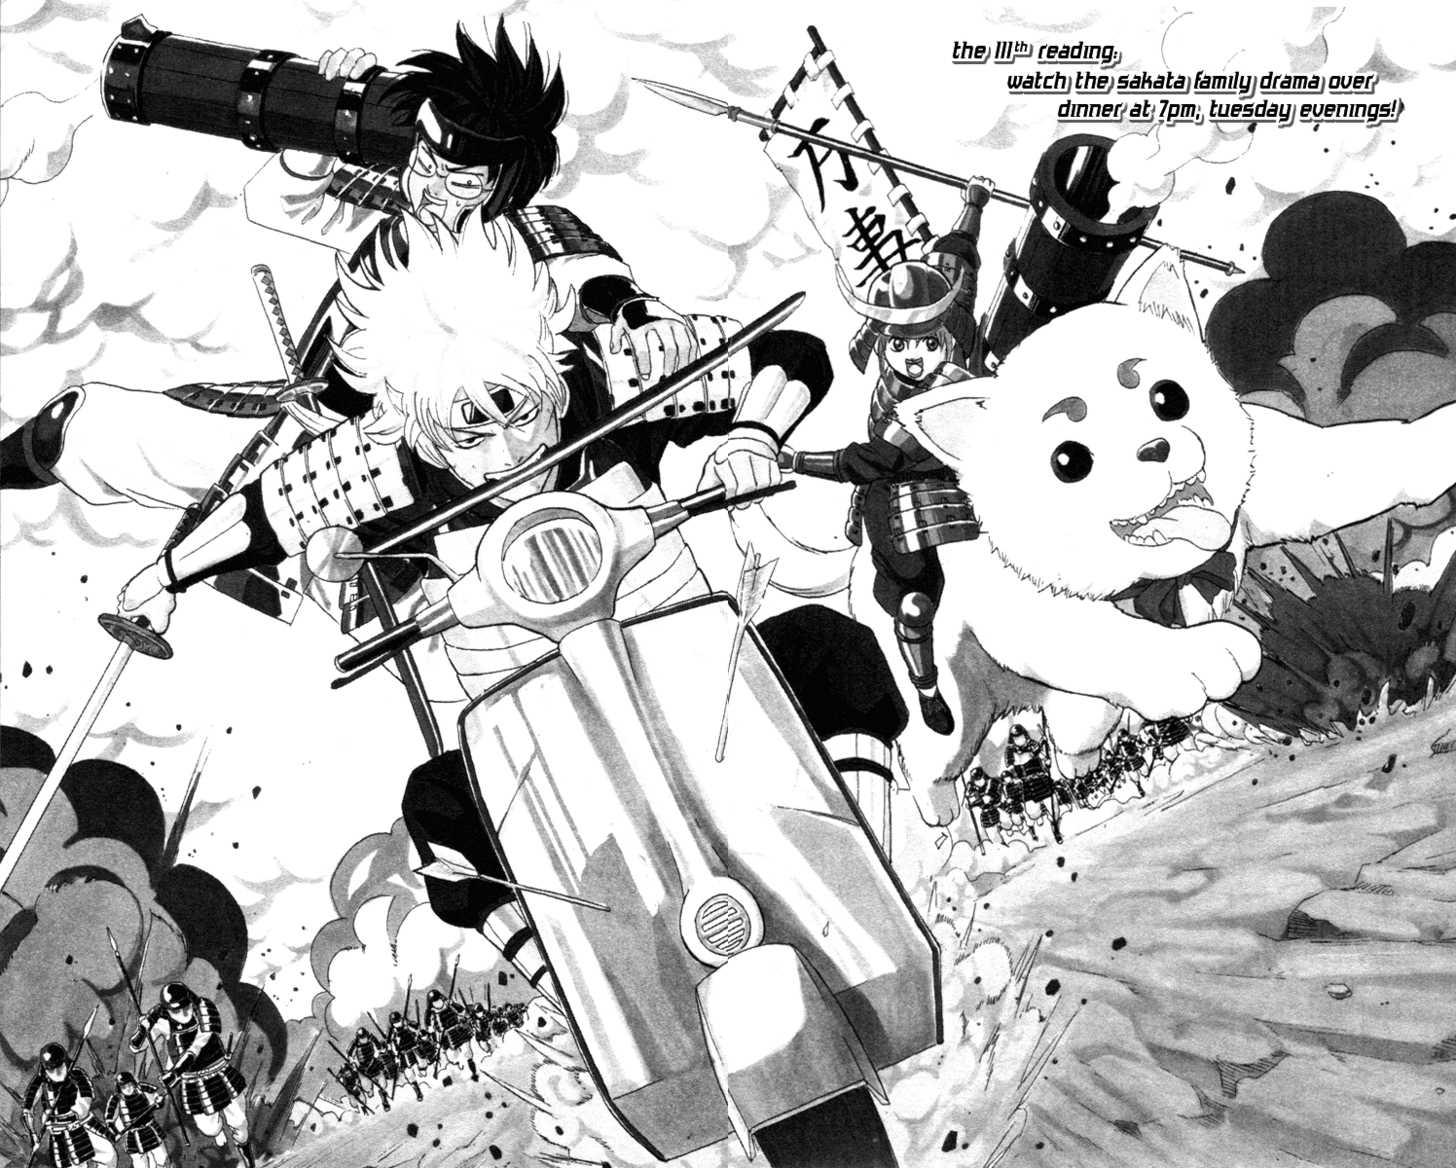 https://im.nineanime.com/comics/pic9/18/210/16524/Gintama1110872.jpg Page 1